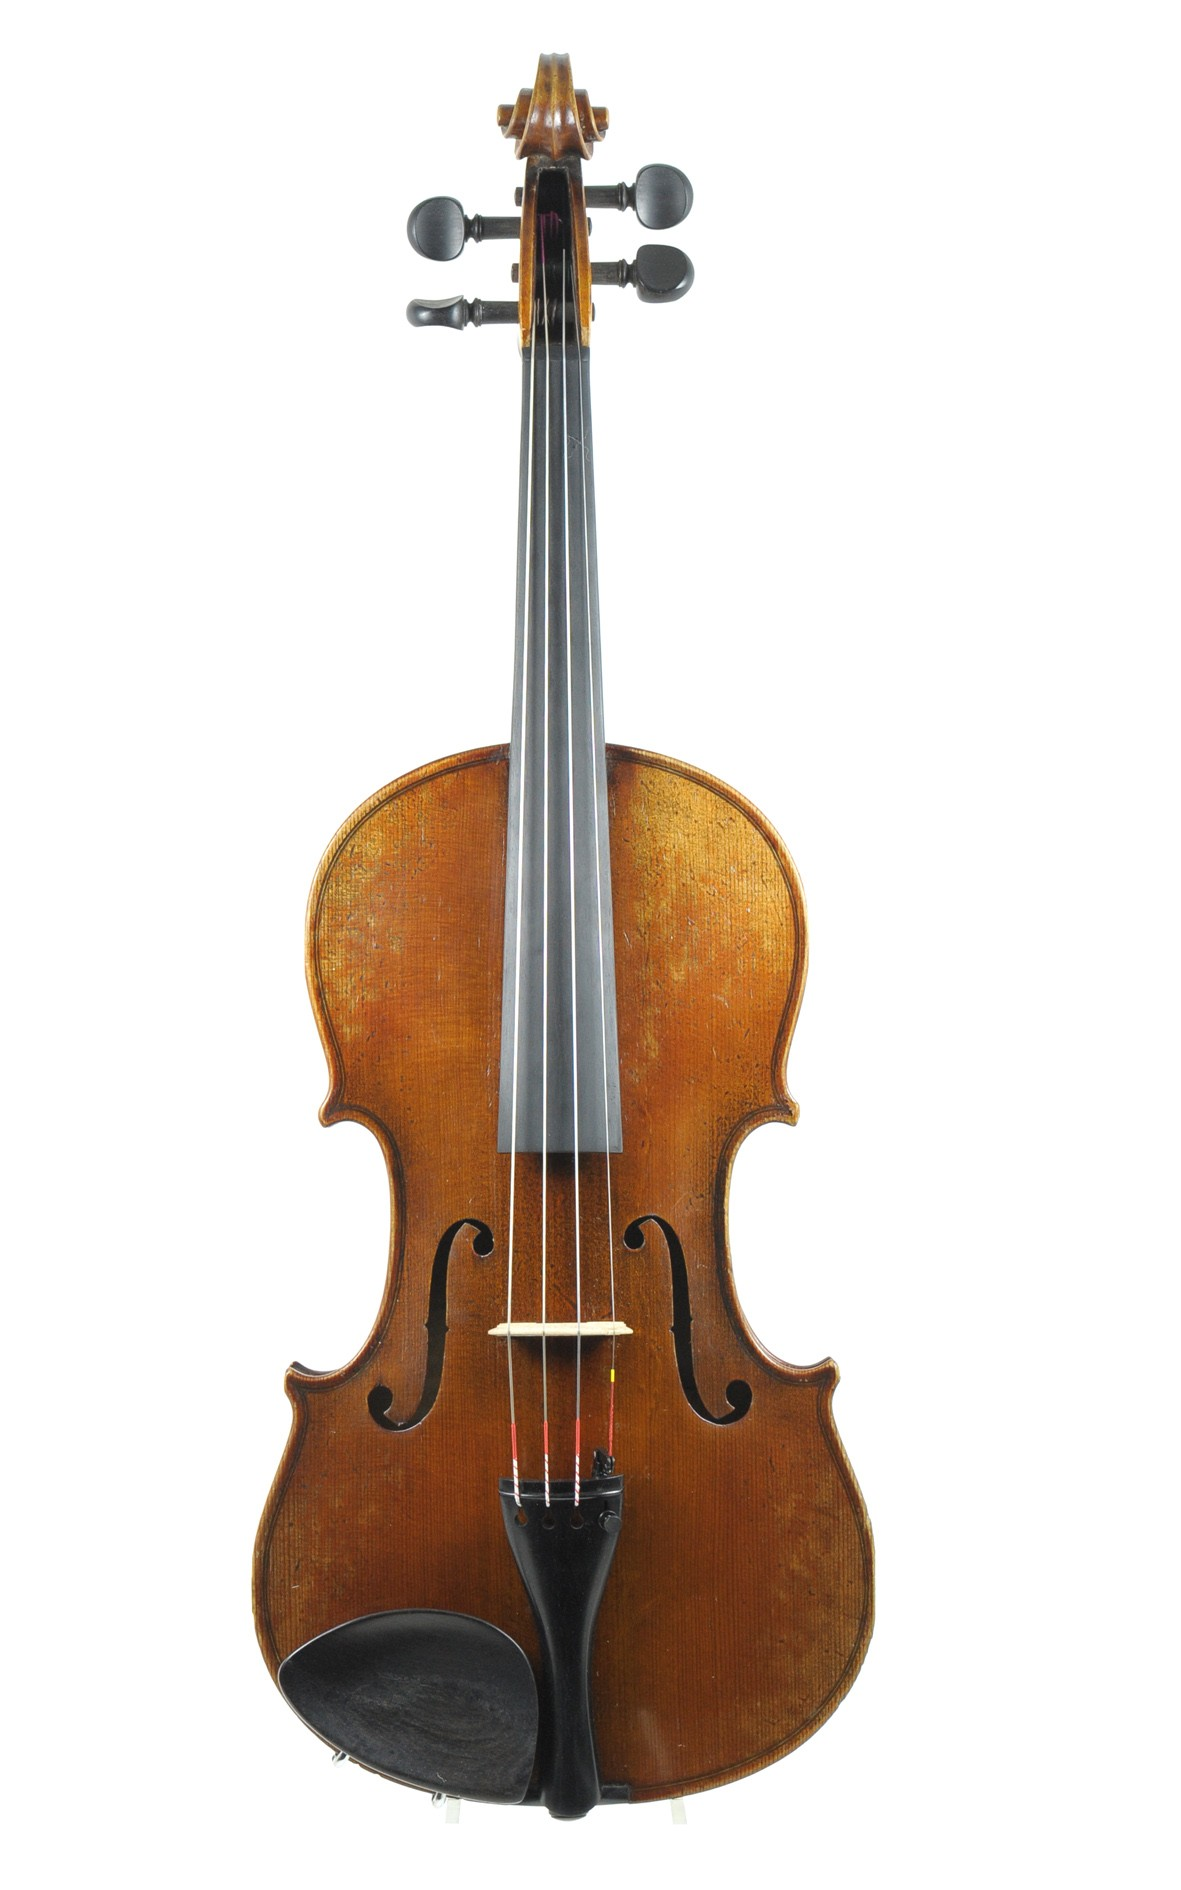 Friedrich Sandner Bubenreuth violin no 28 - top